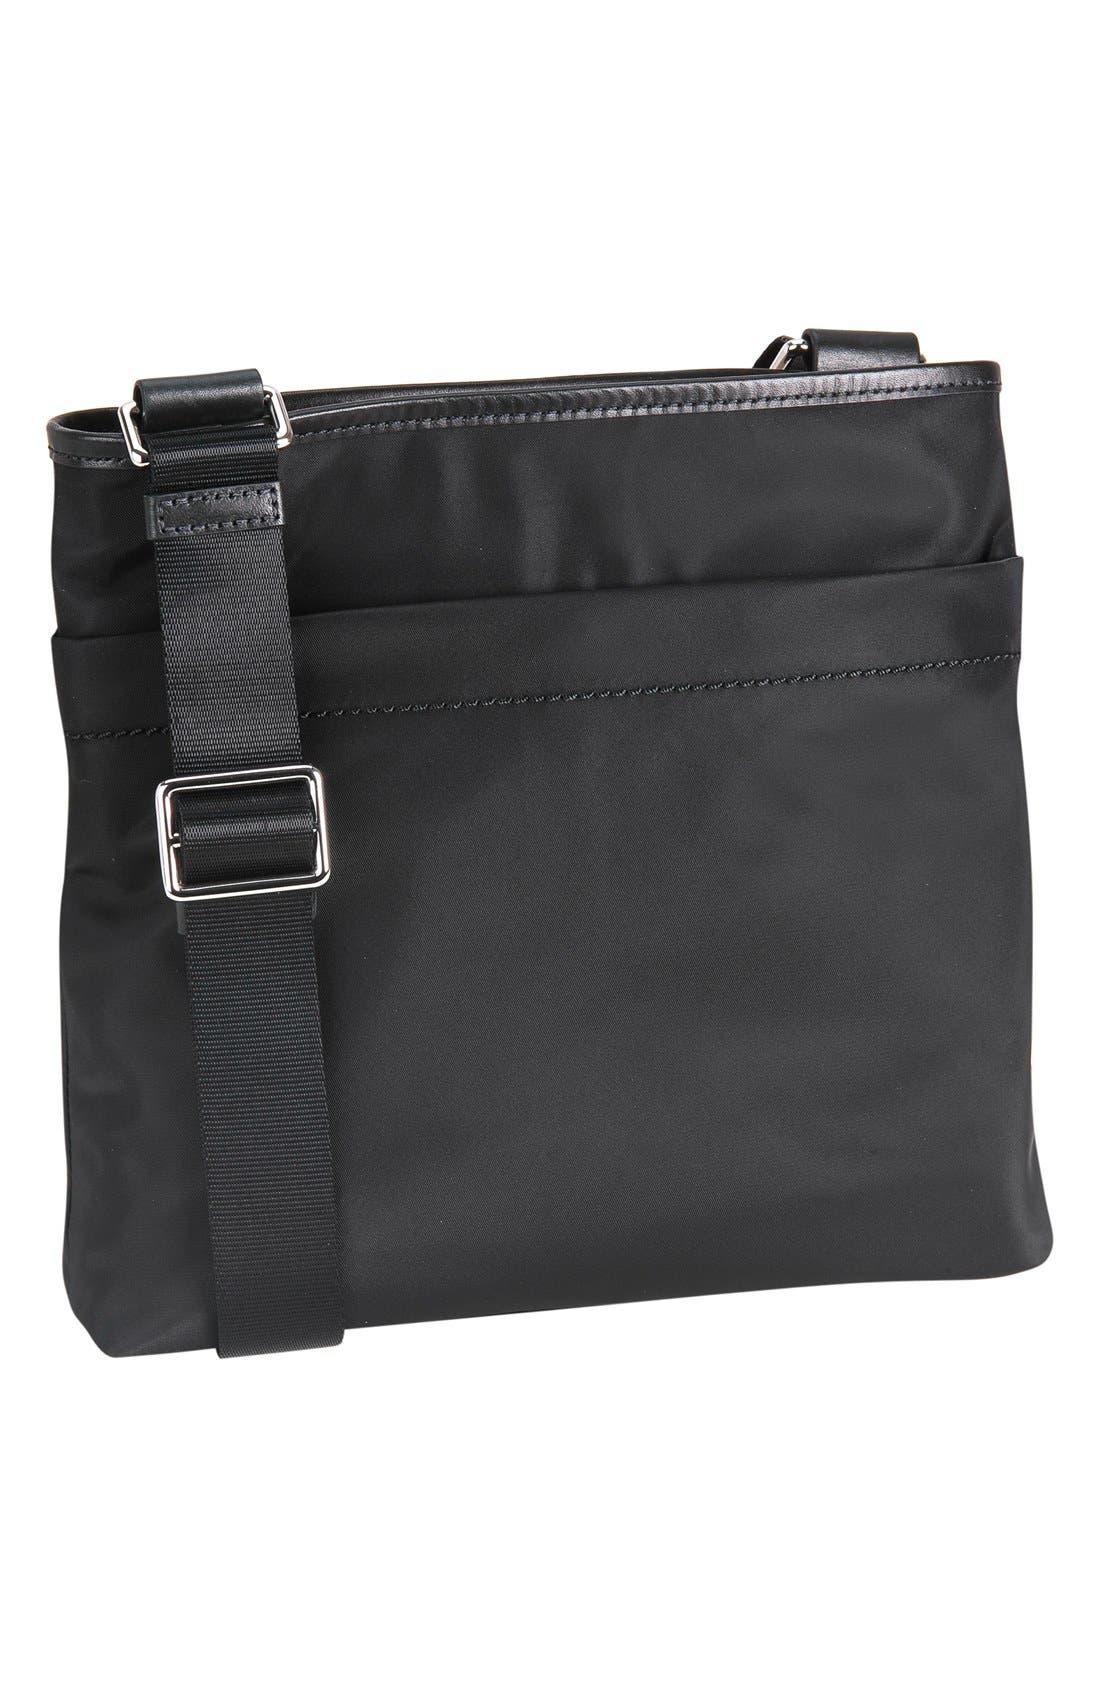 TUMI,                             'Voyageur - Capri' Crossbody Bag,                             Alternate thumbnail 3, color,                             001